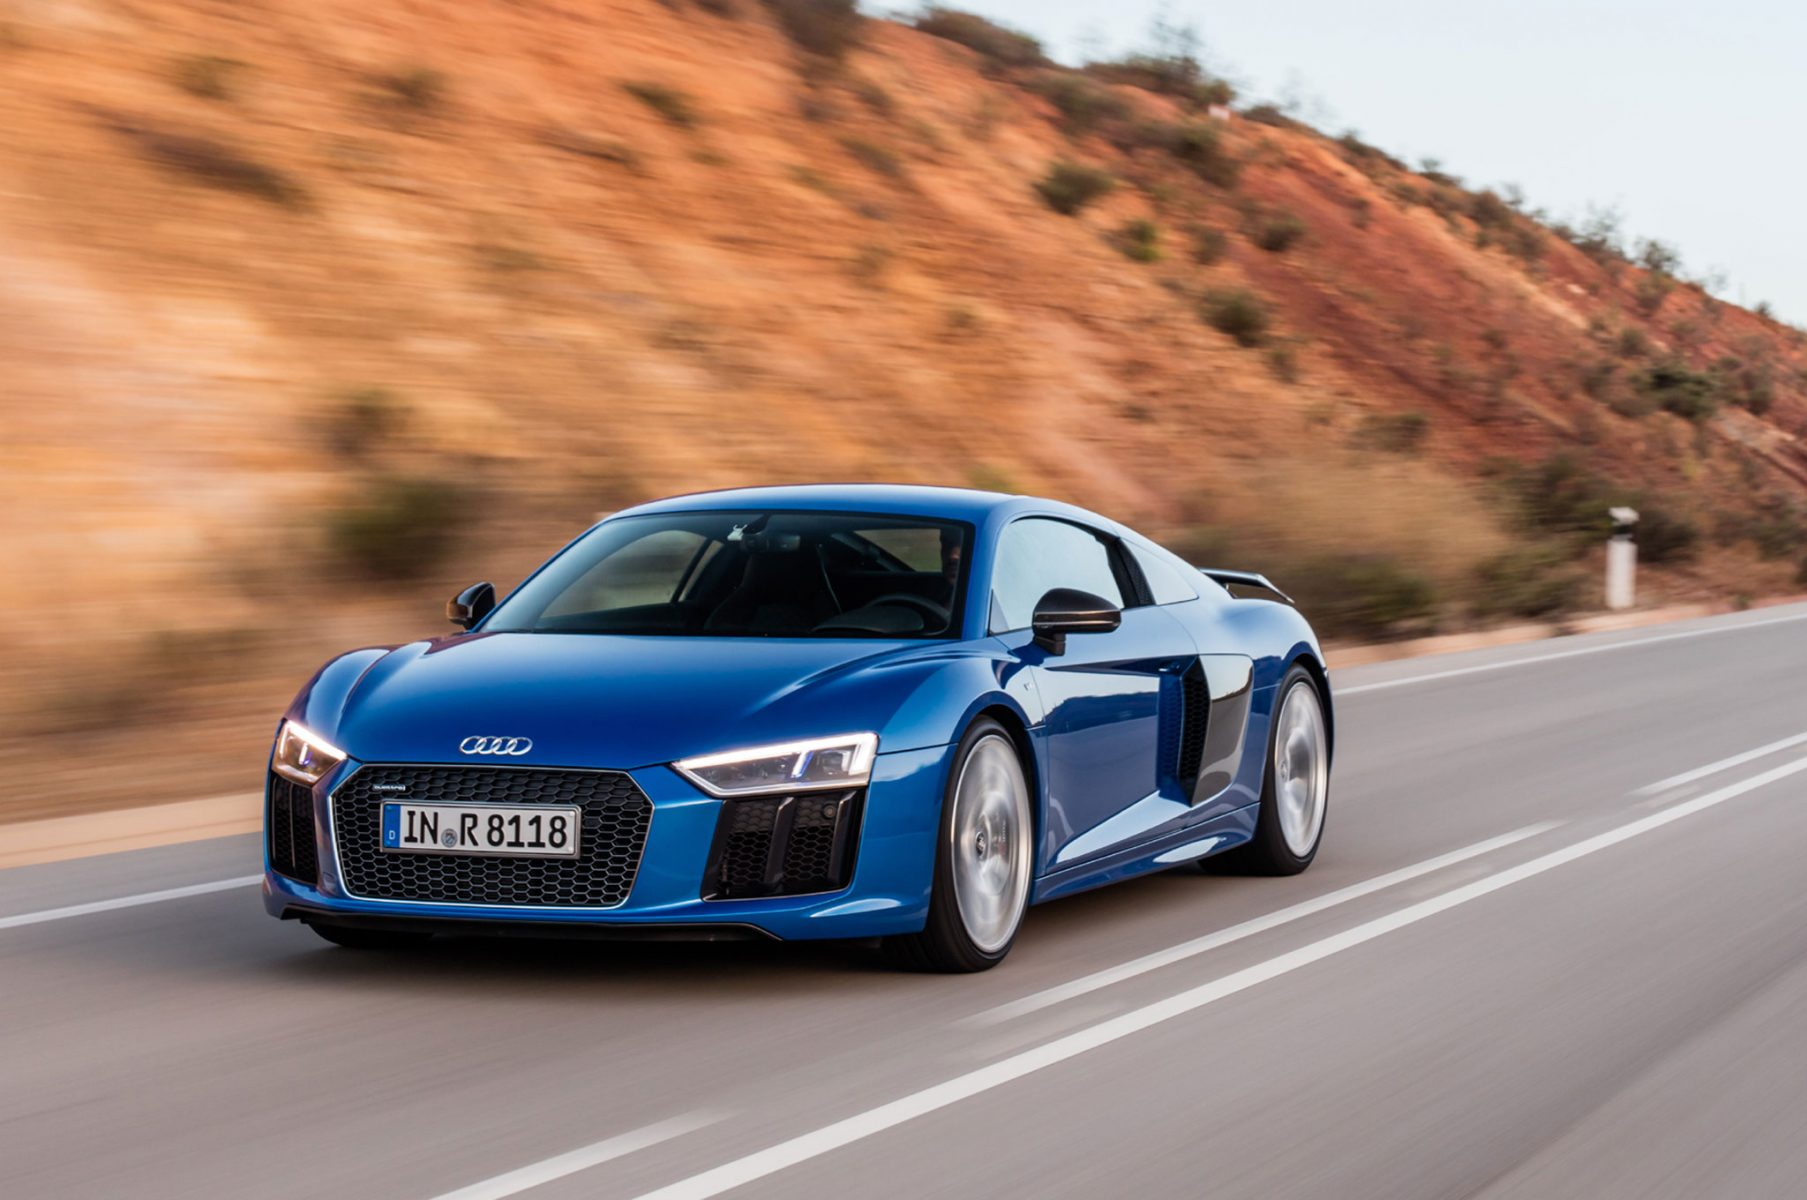 2017 Audi R8 V10 Plus front three quarter in motion 02